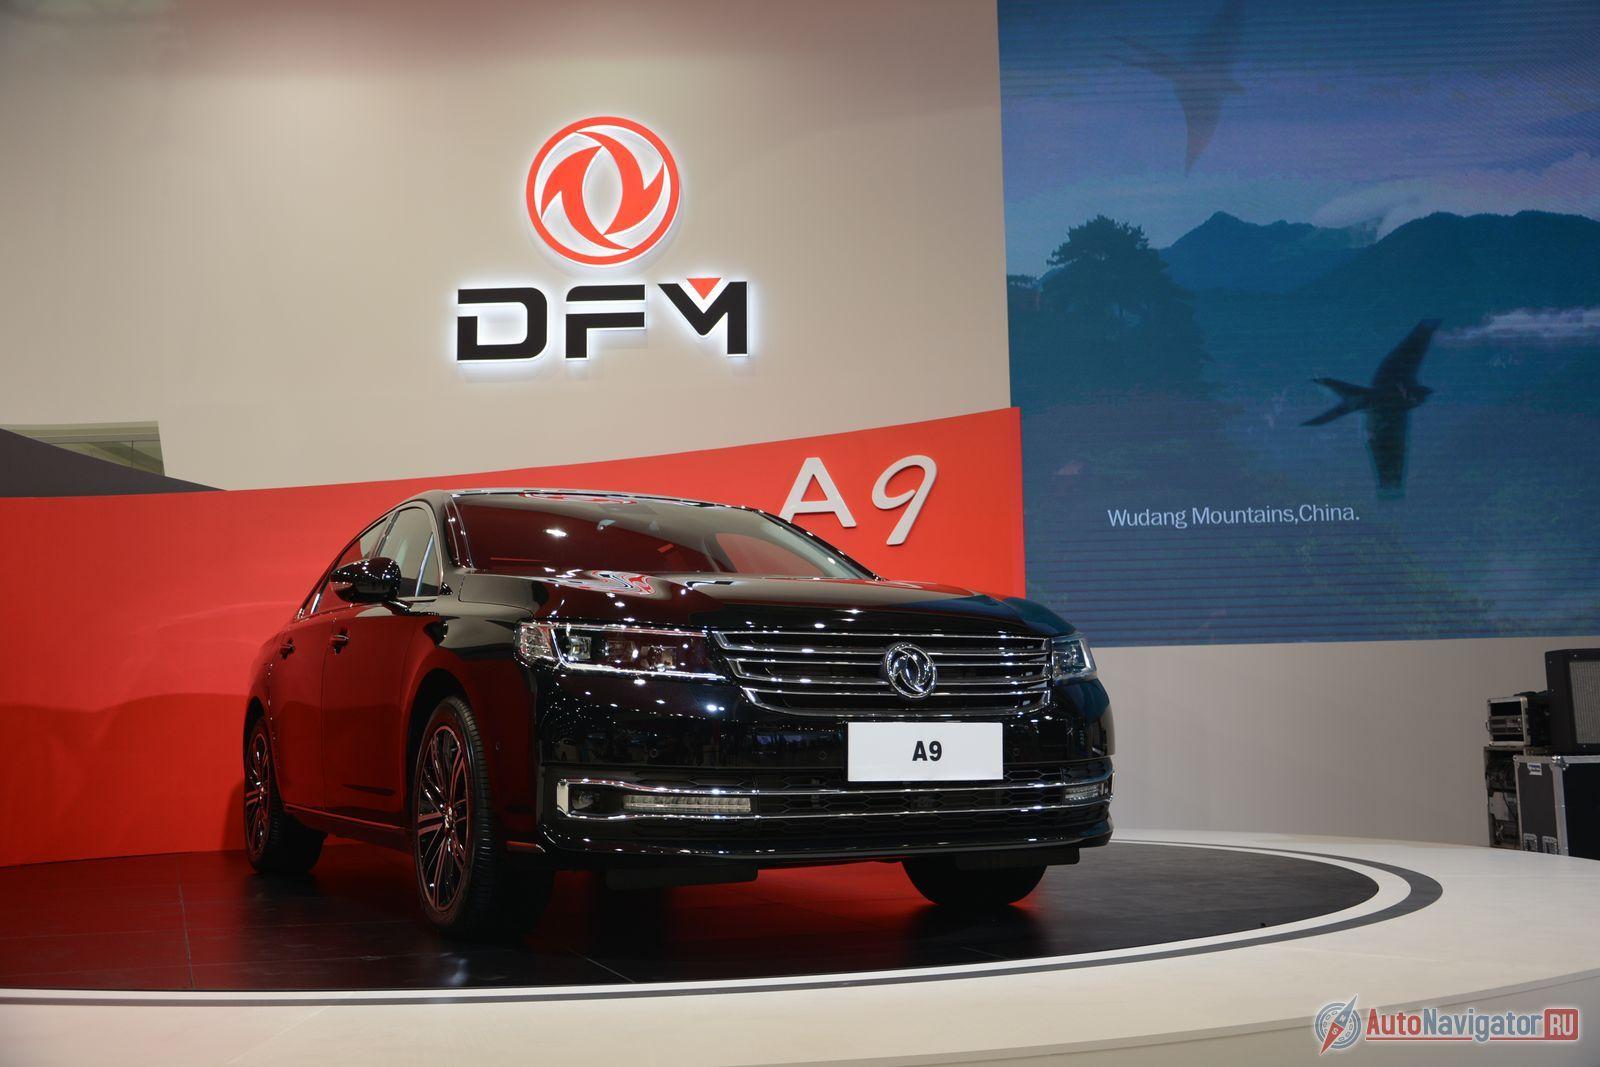 DFM A9